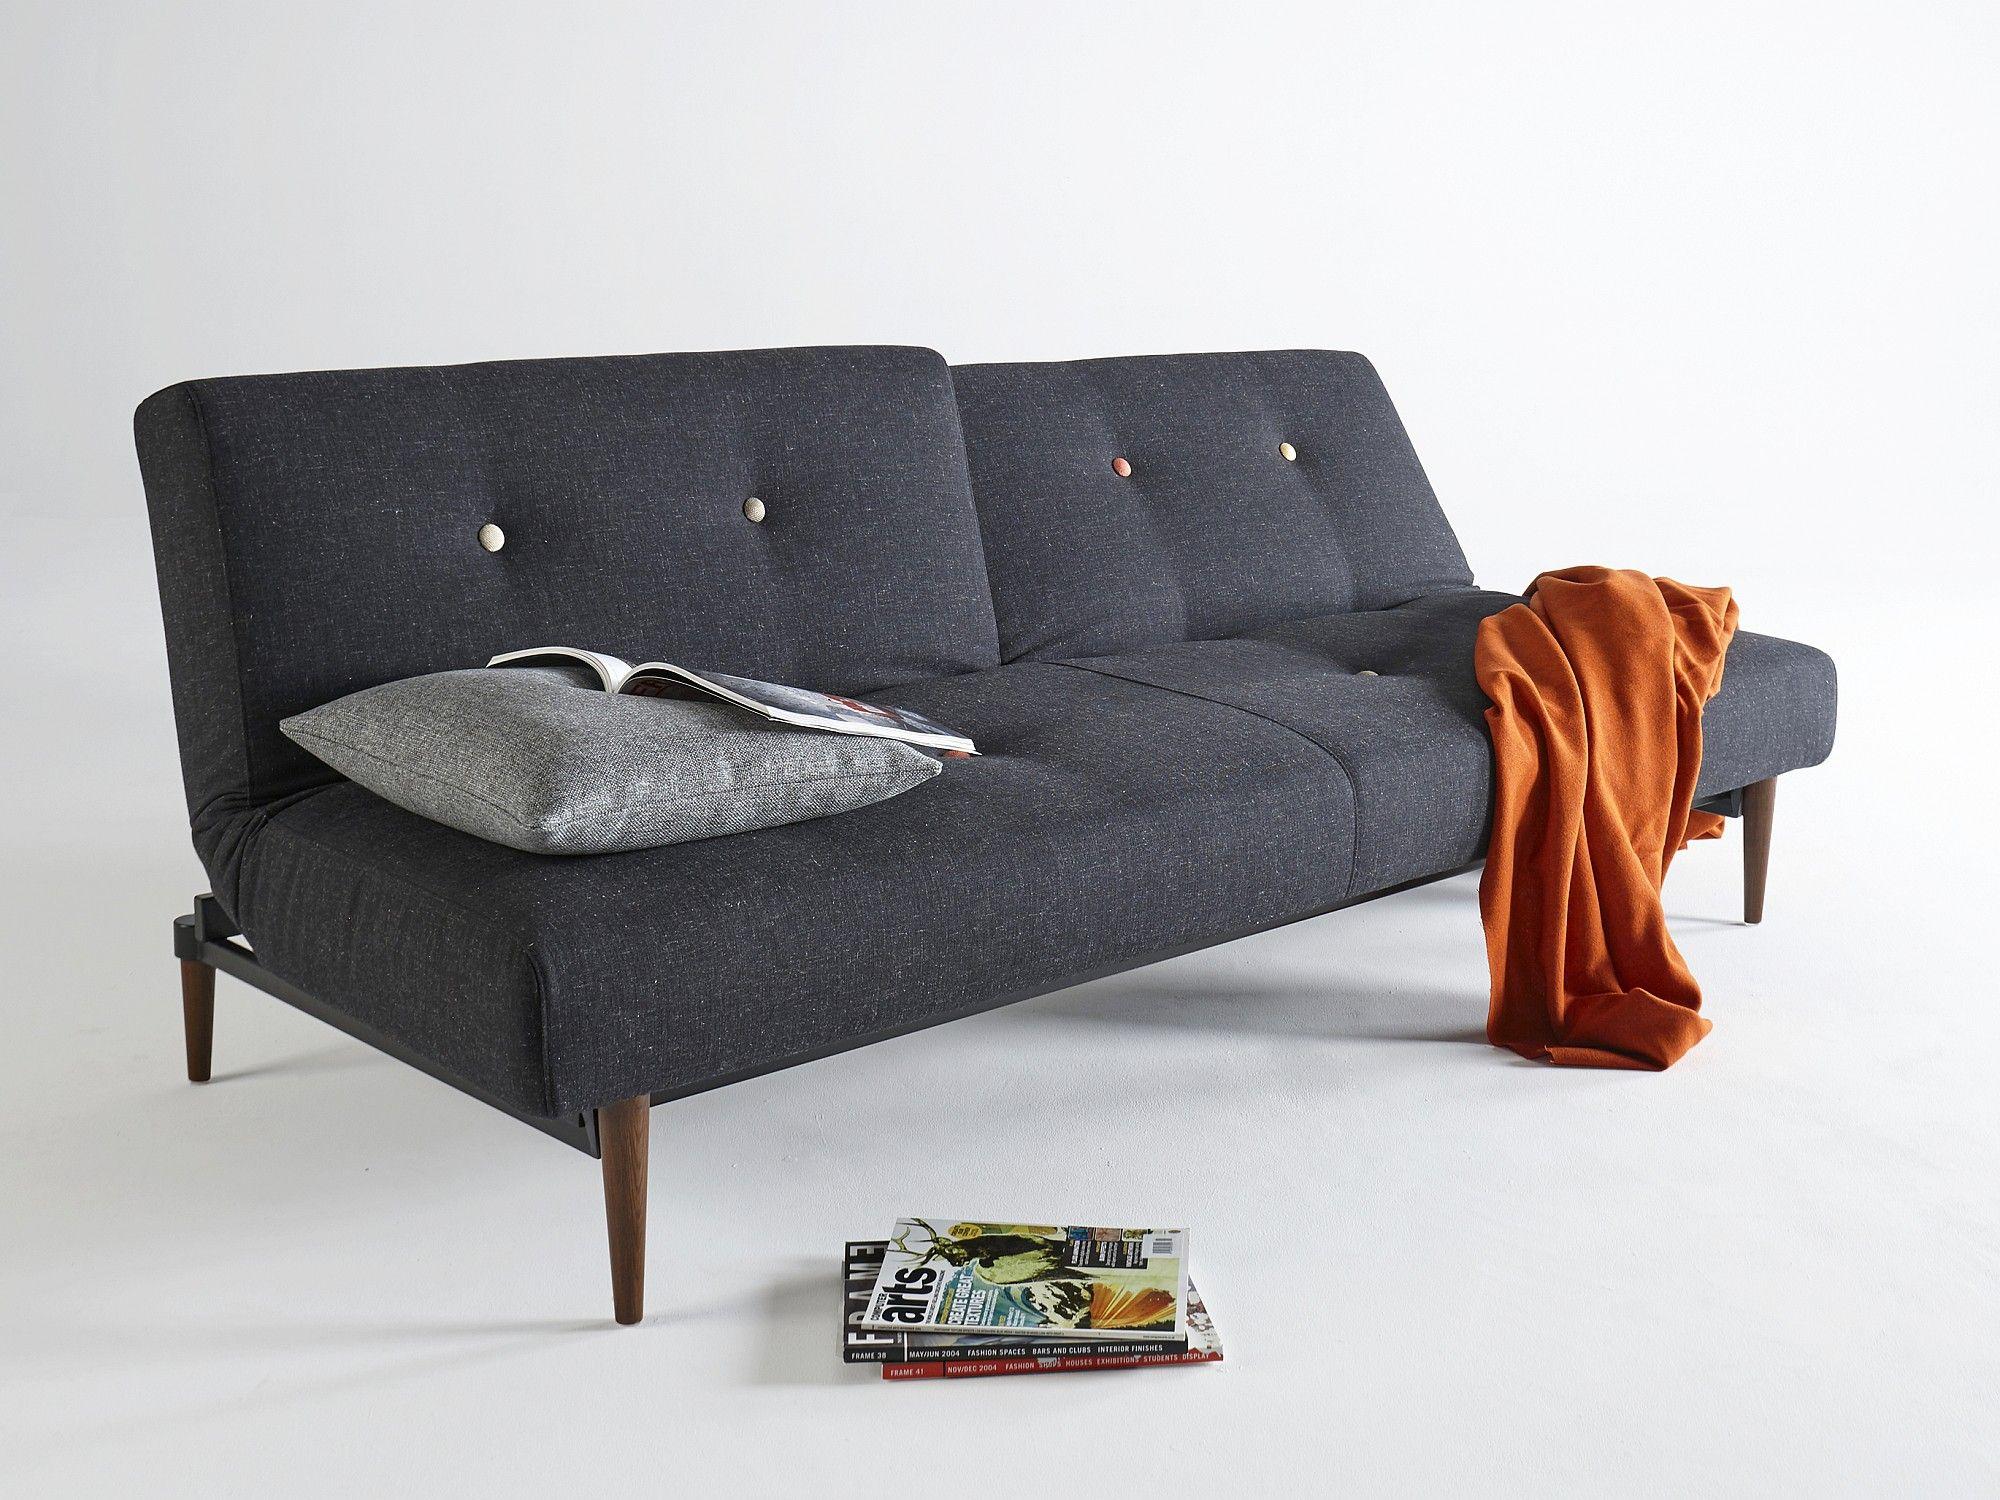 Innovation Klappsofa Fiftynine Beige Schwarz home